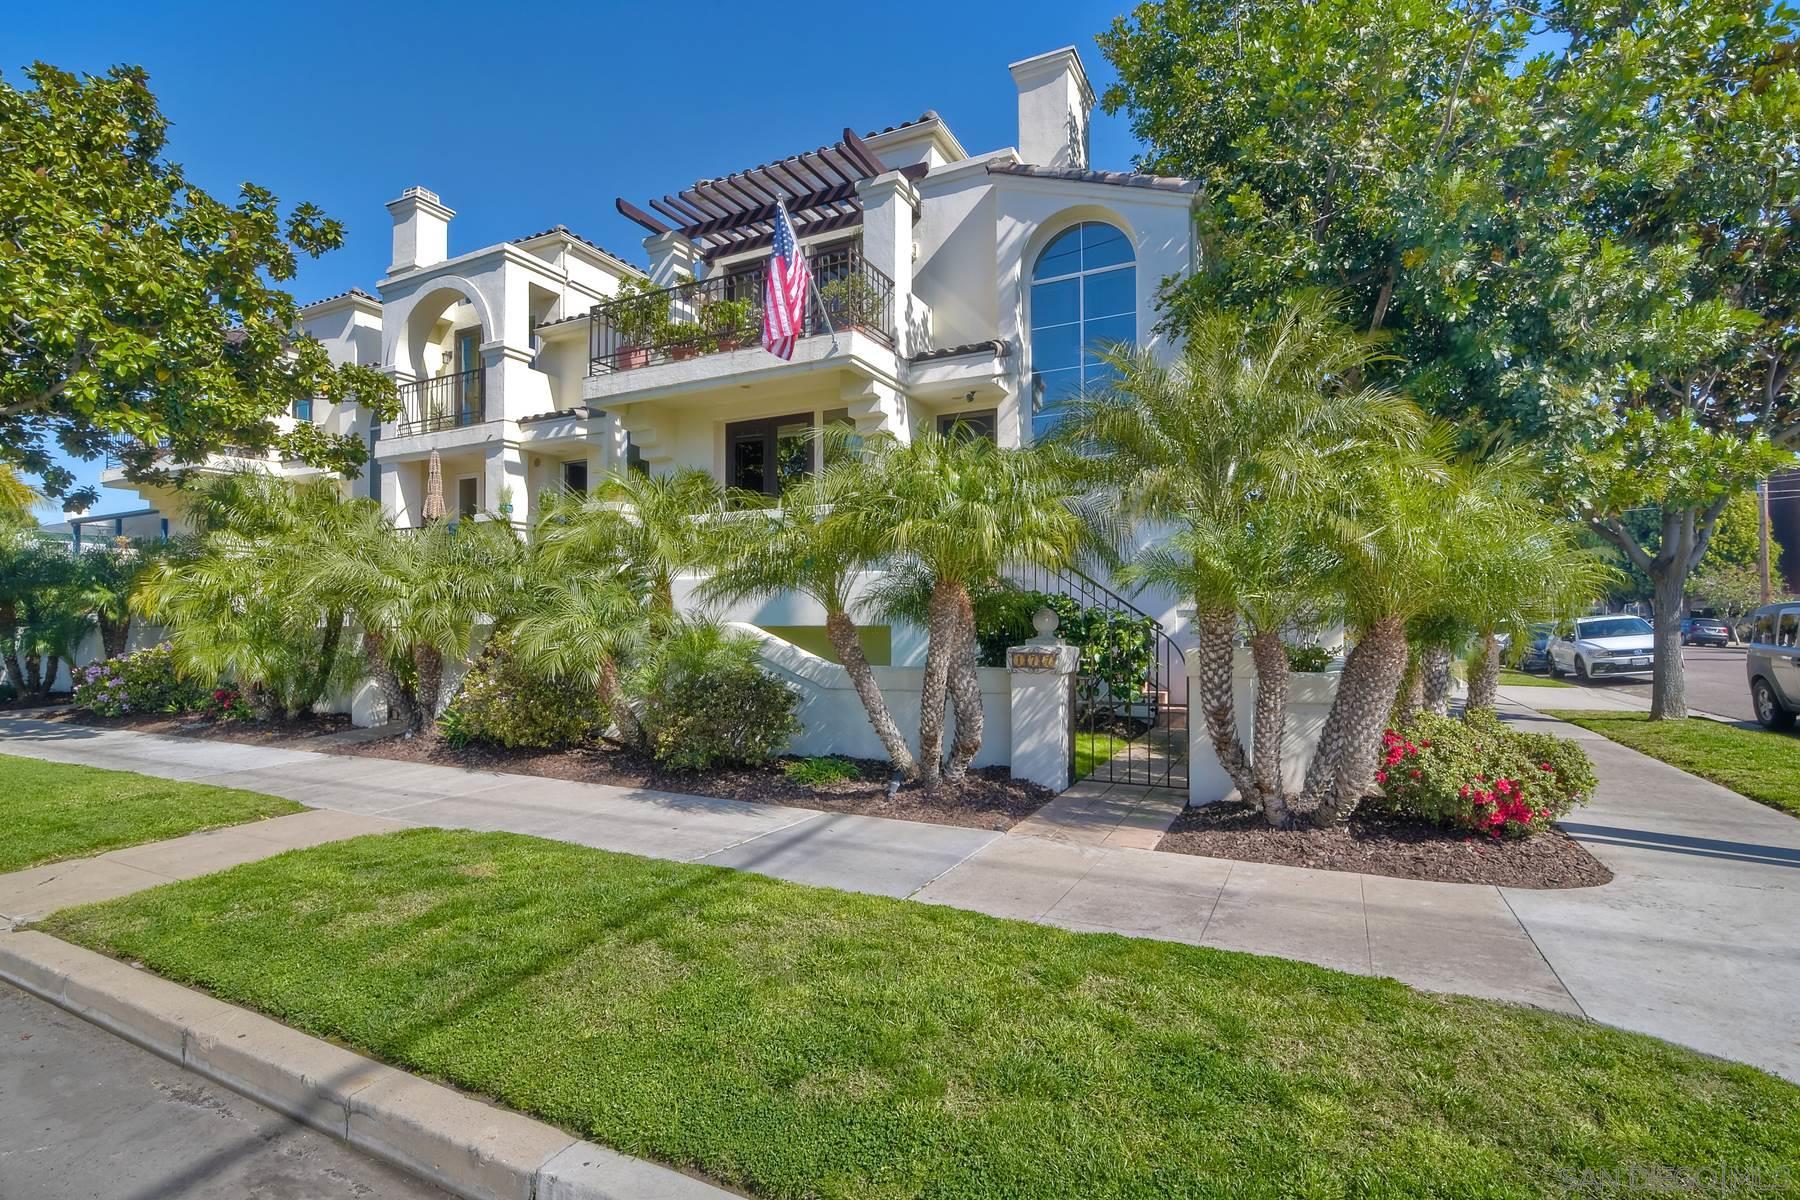 177 D Ave, Coronado, California 92118, 3 Bedrooms Bedrooms, ,3 BathroomsBathrooms,Townhouse,For Sale,177 D Ave,2,210006468